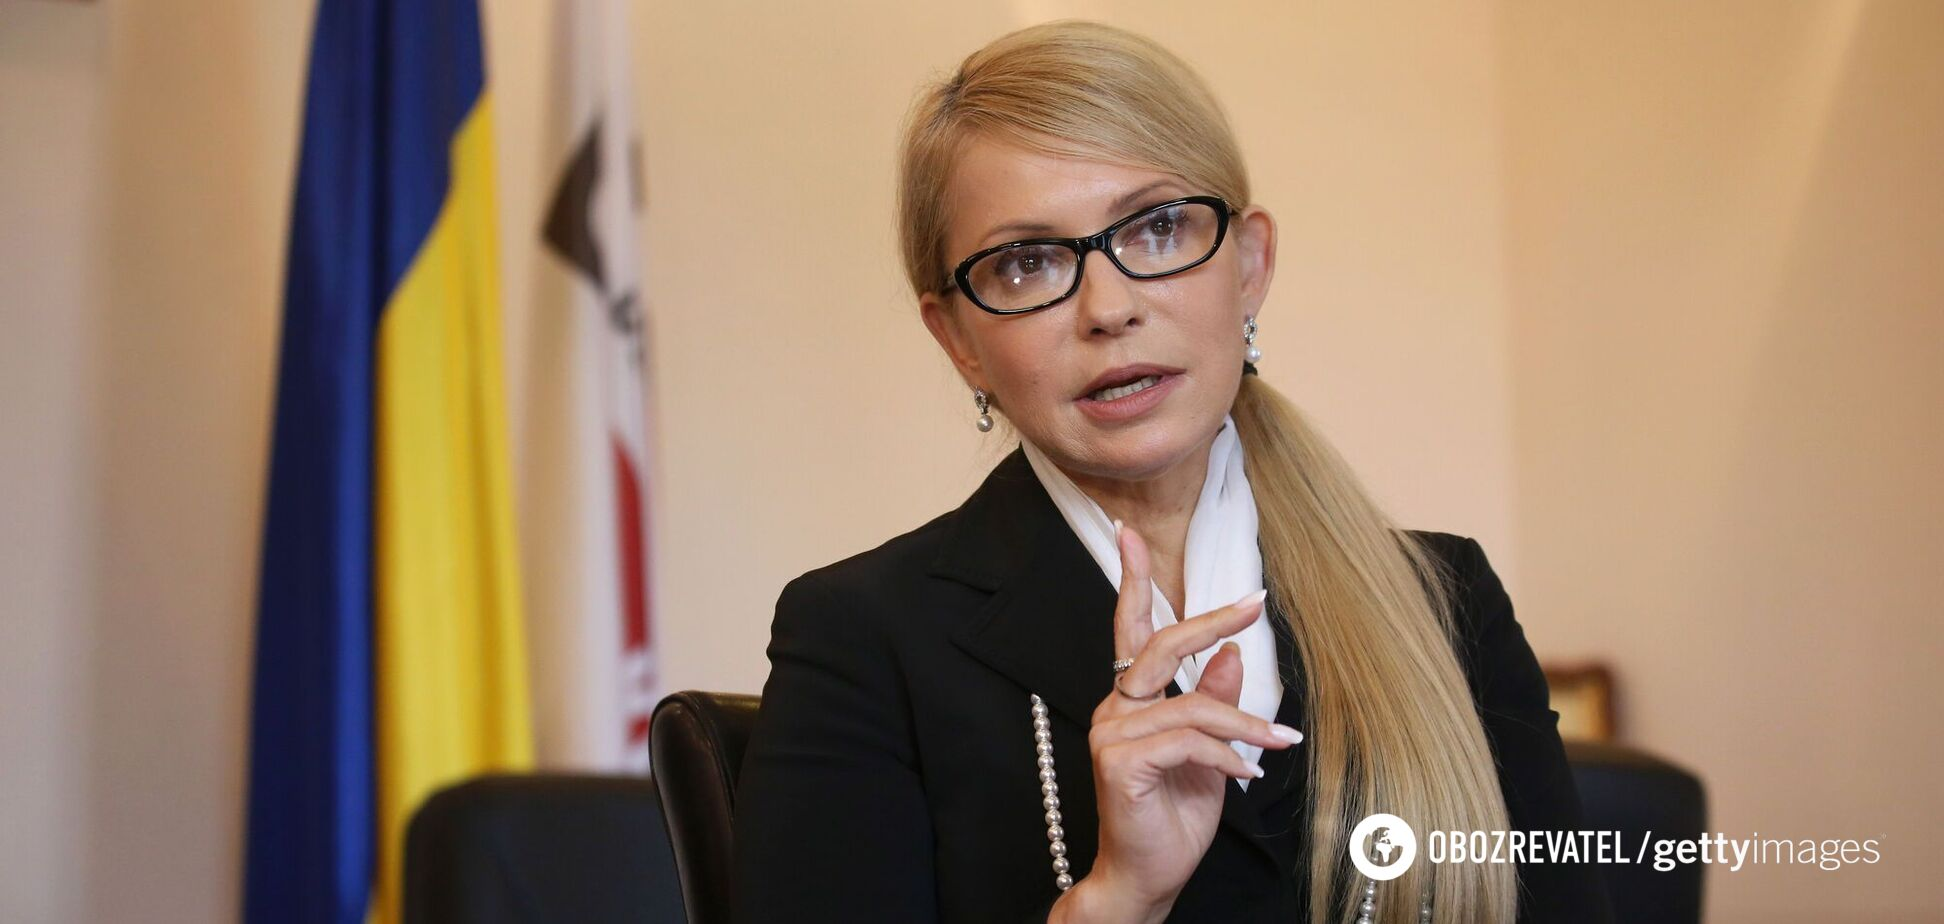 Тимошенко рассказала, как победила COVID-19